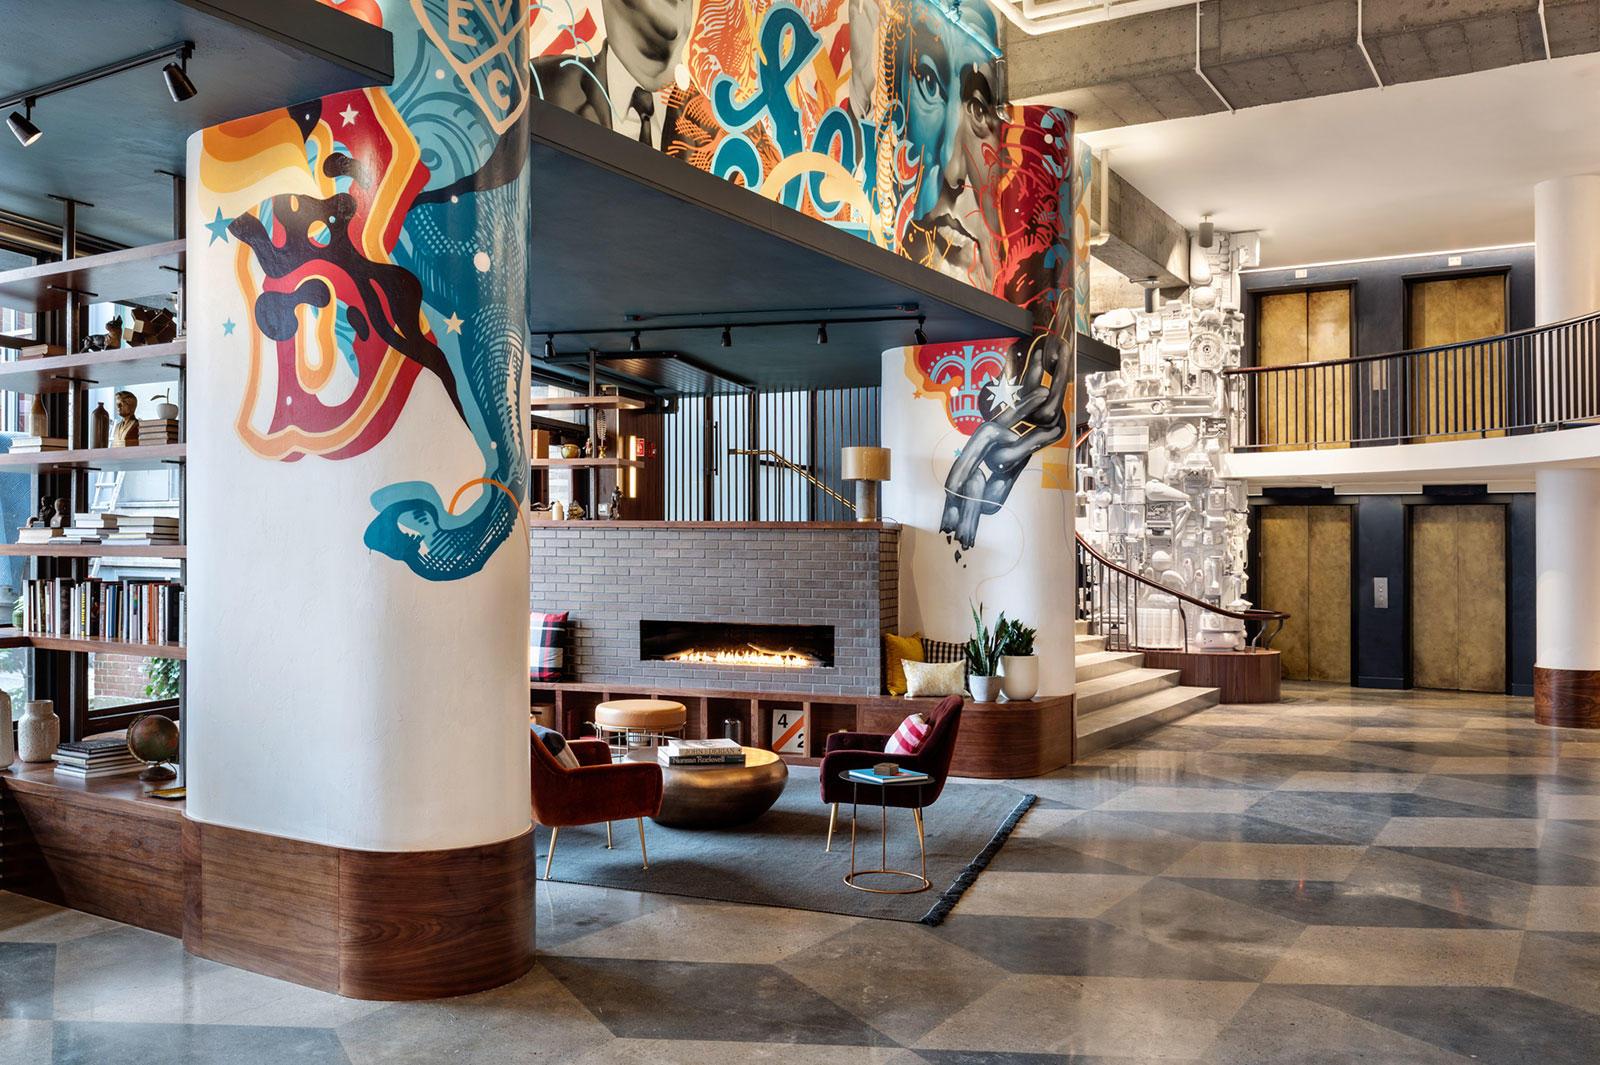 The Revolution Hotel image 2